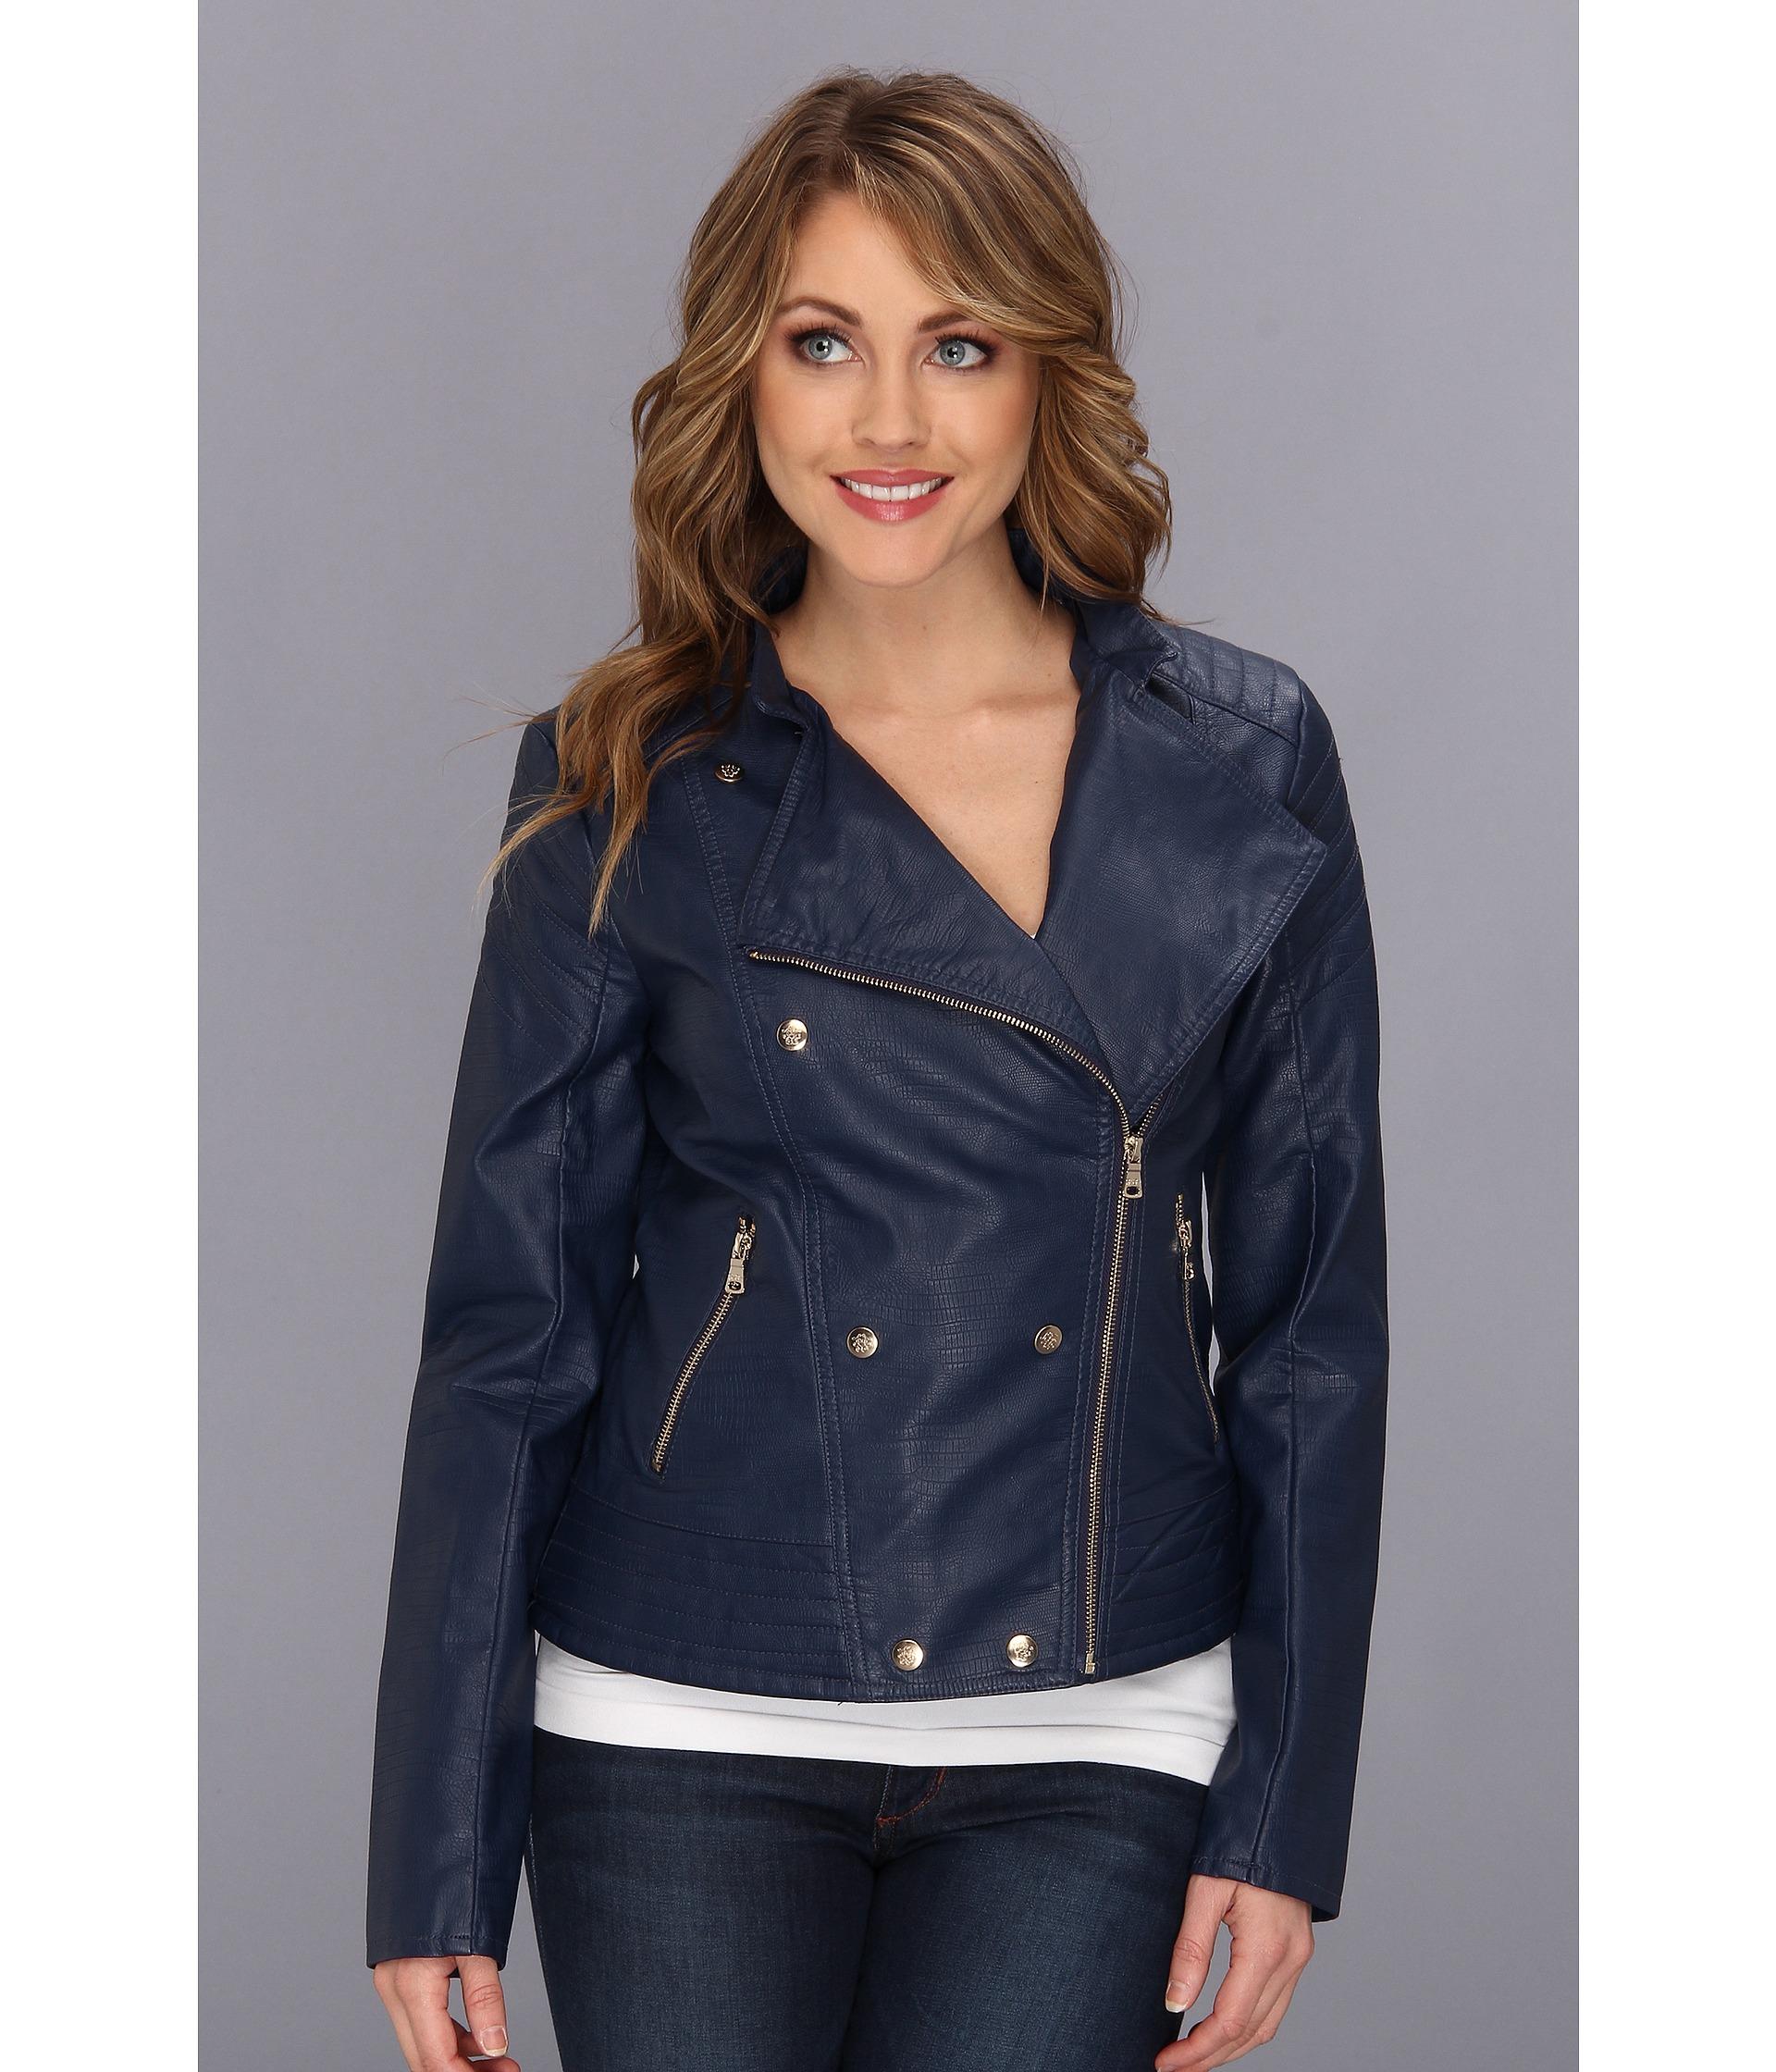 Jessica simpson faux leather jacket